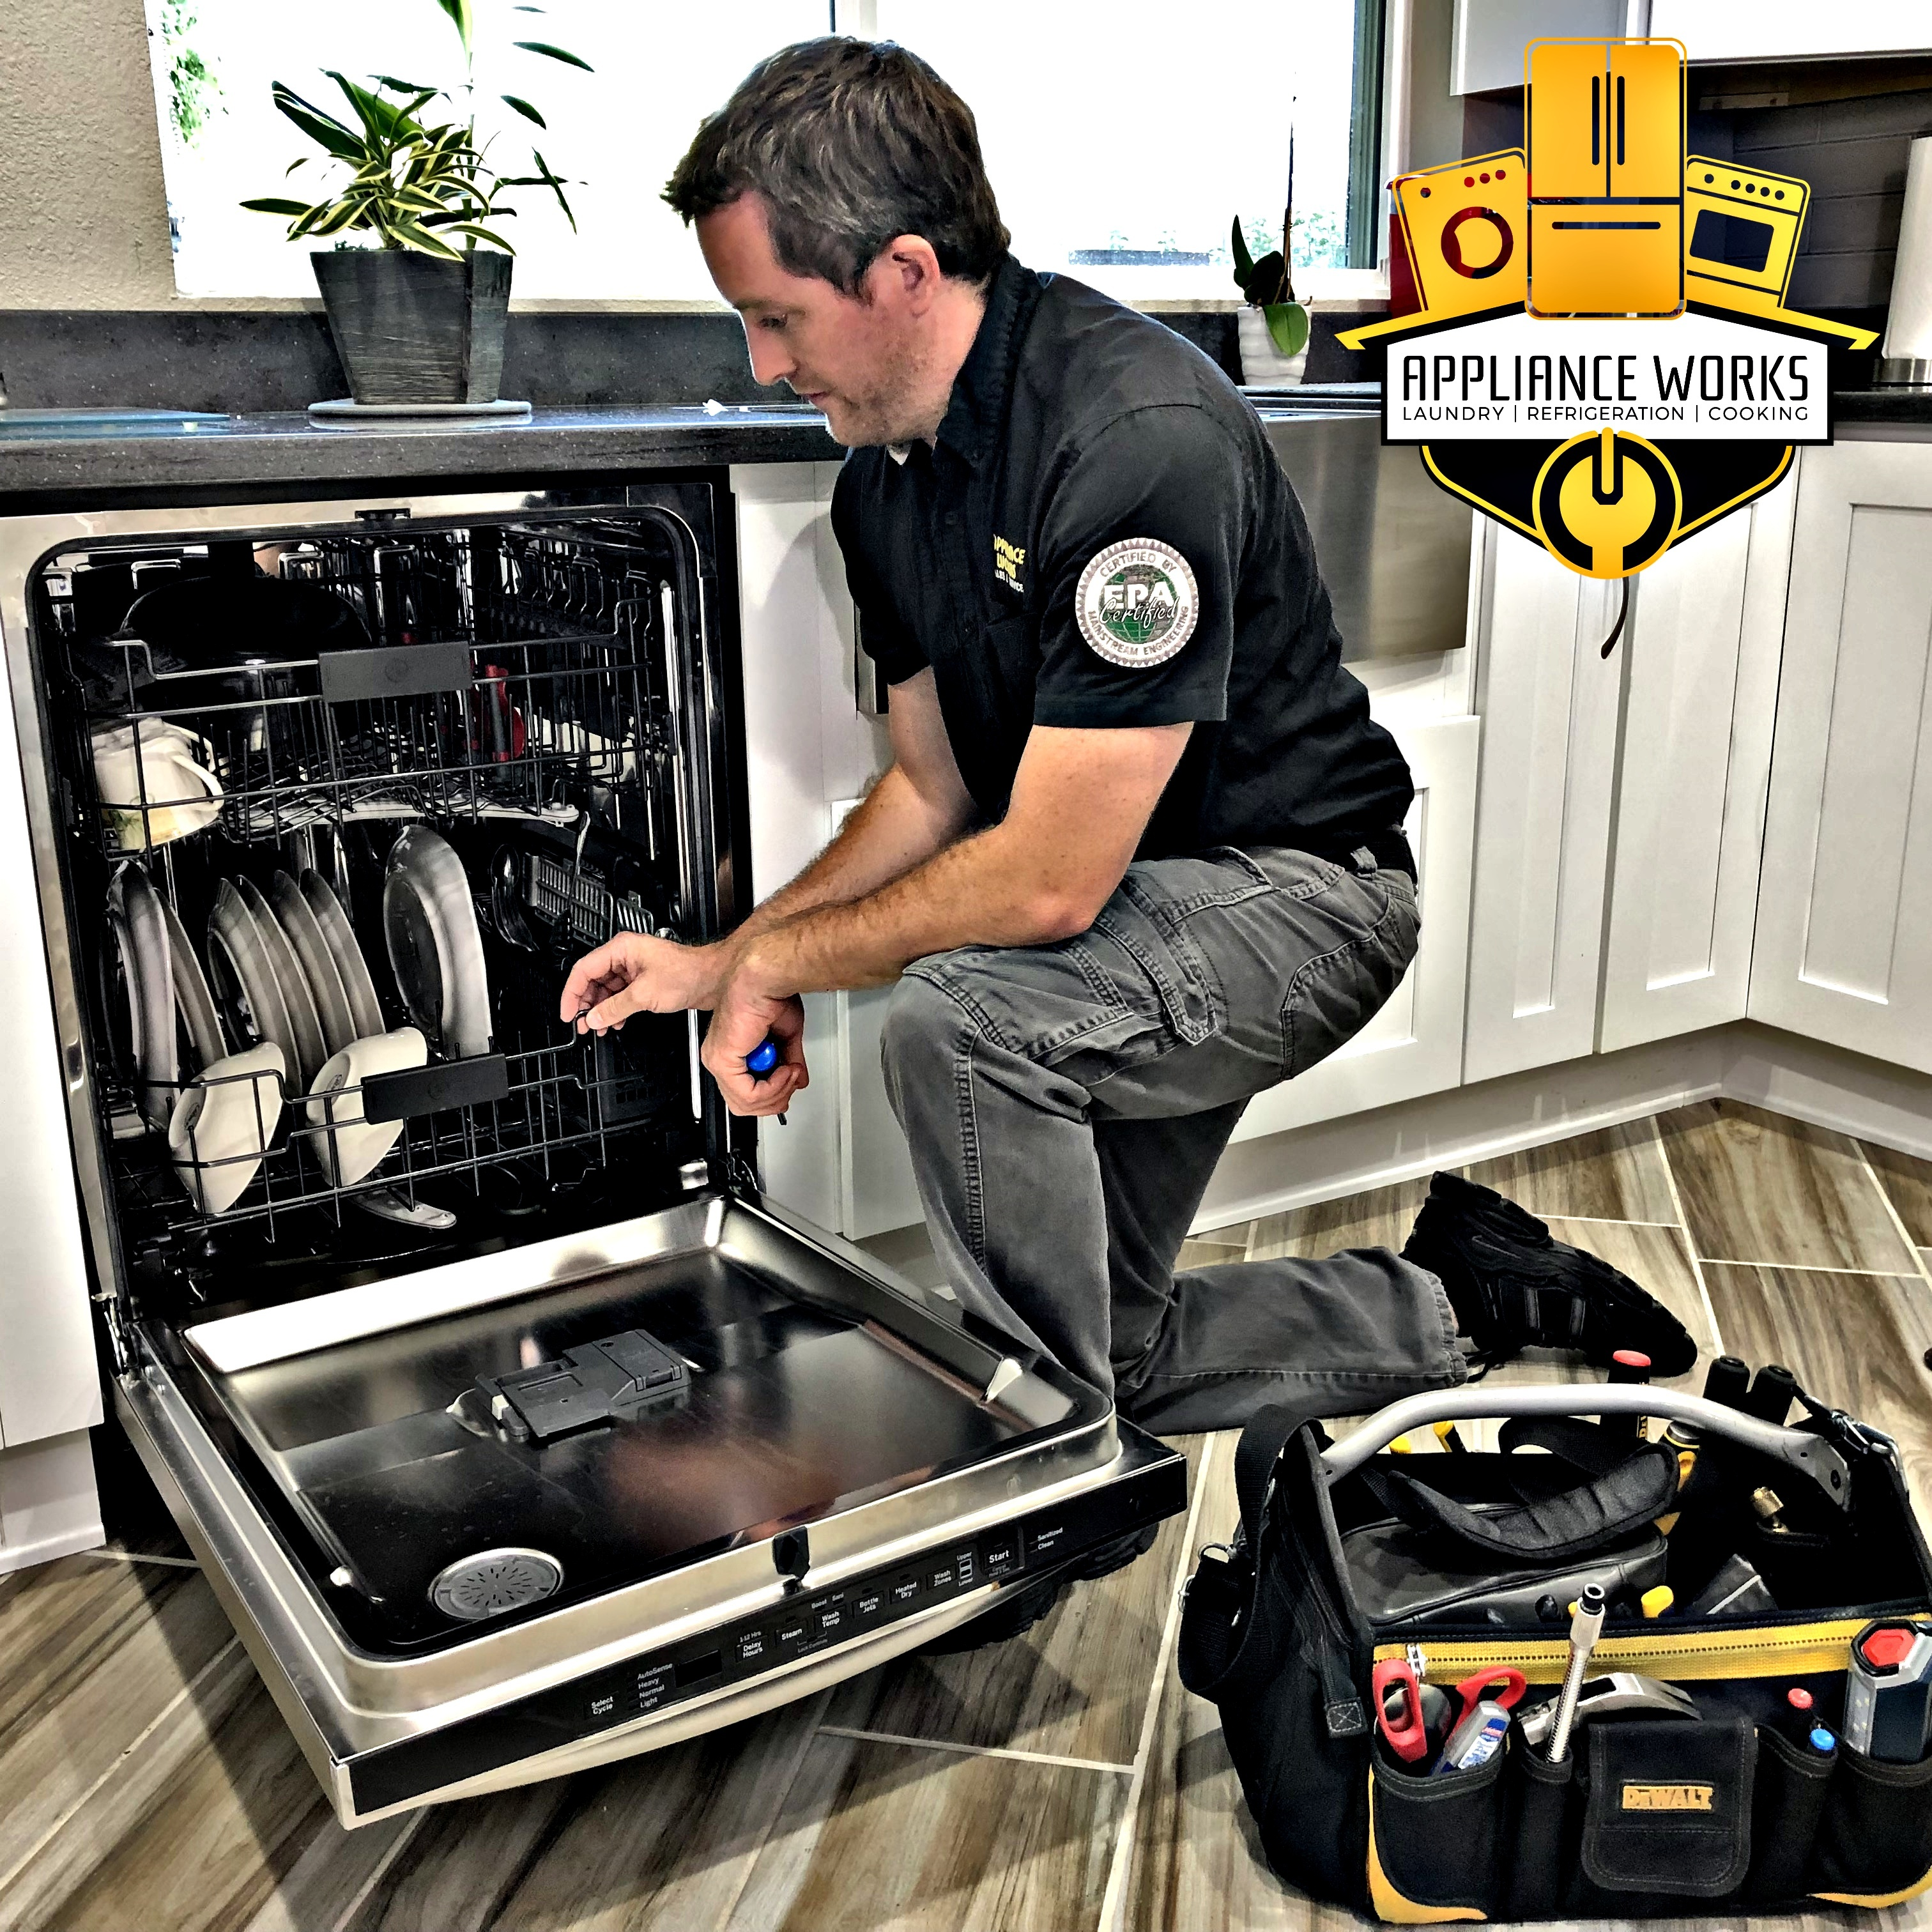 https://applianceworksaz.com/wp-content/uploads/2019/10/Dishwasher-Listing-HDR-Photo.jpg